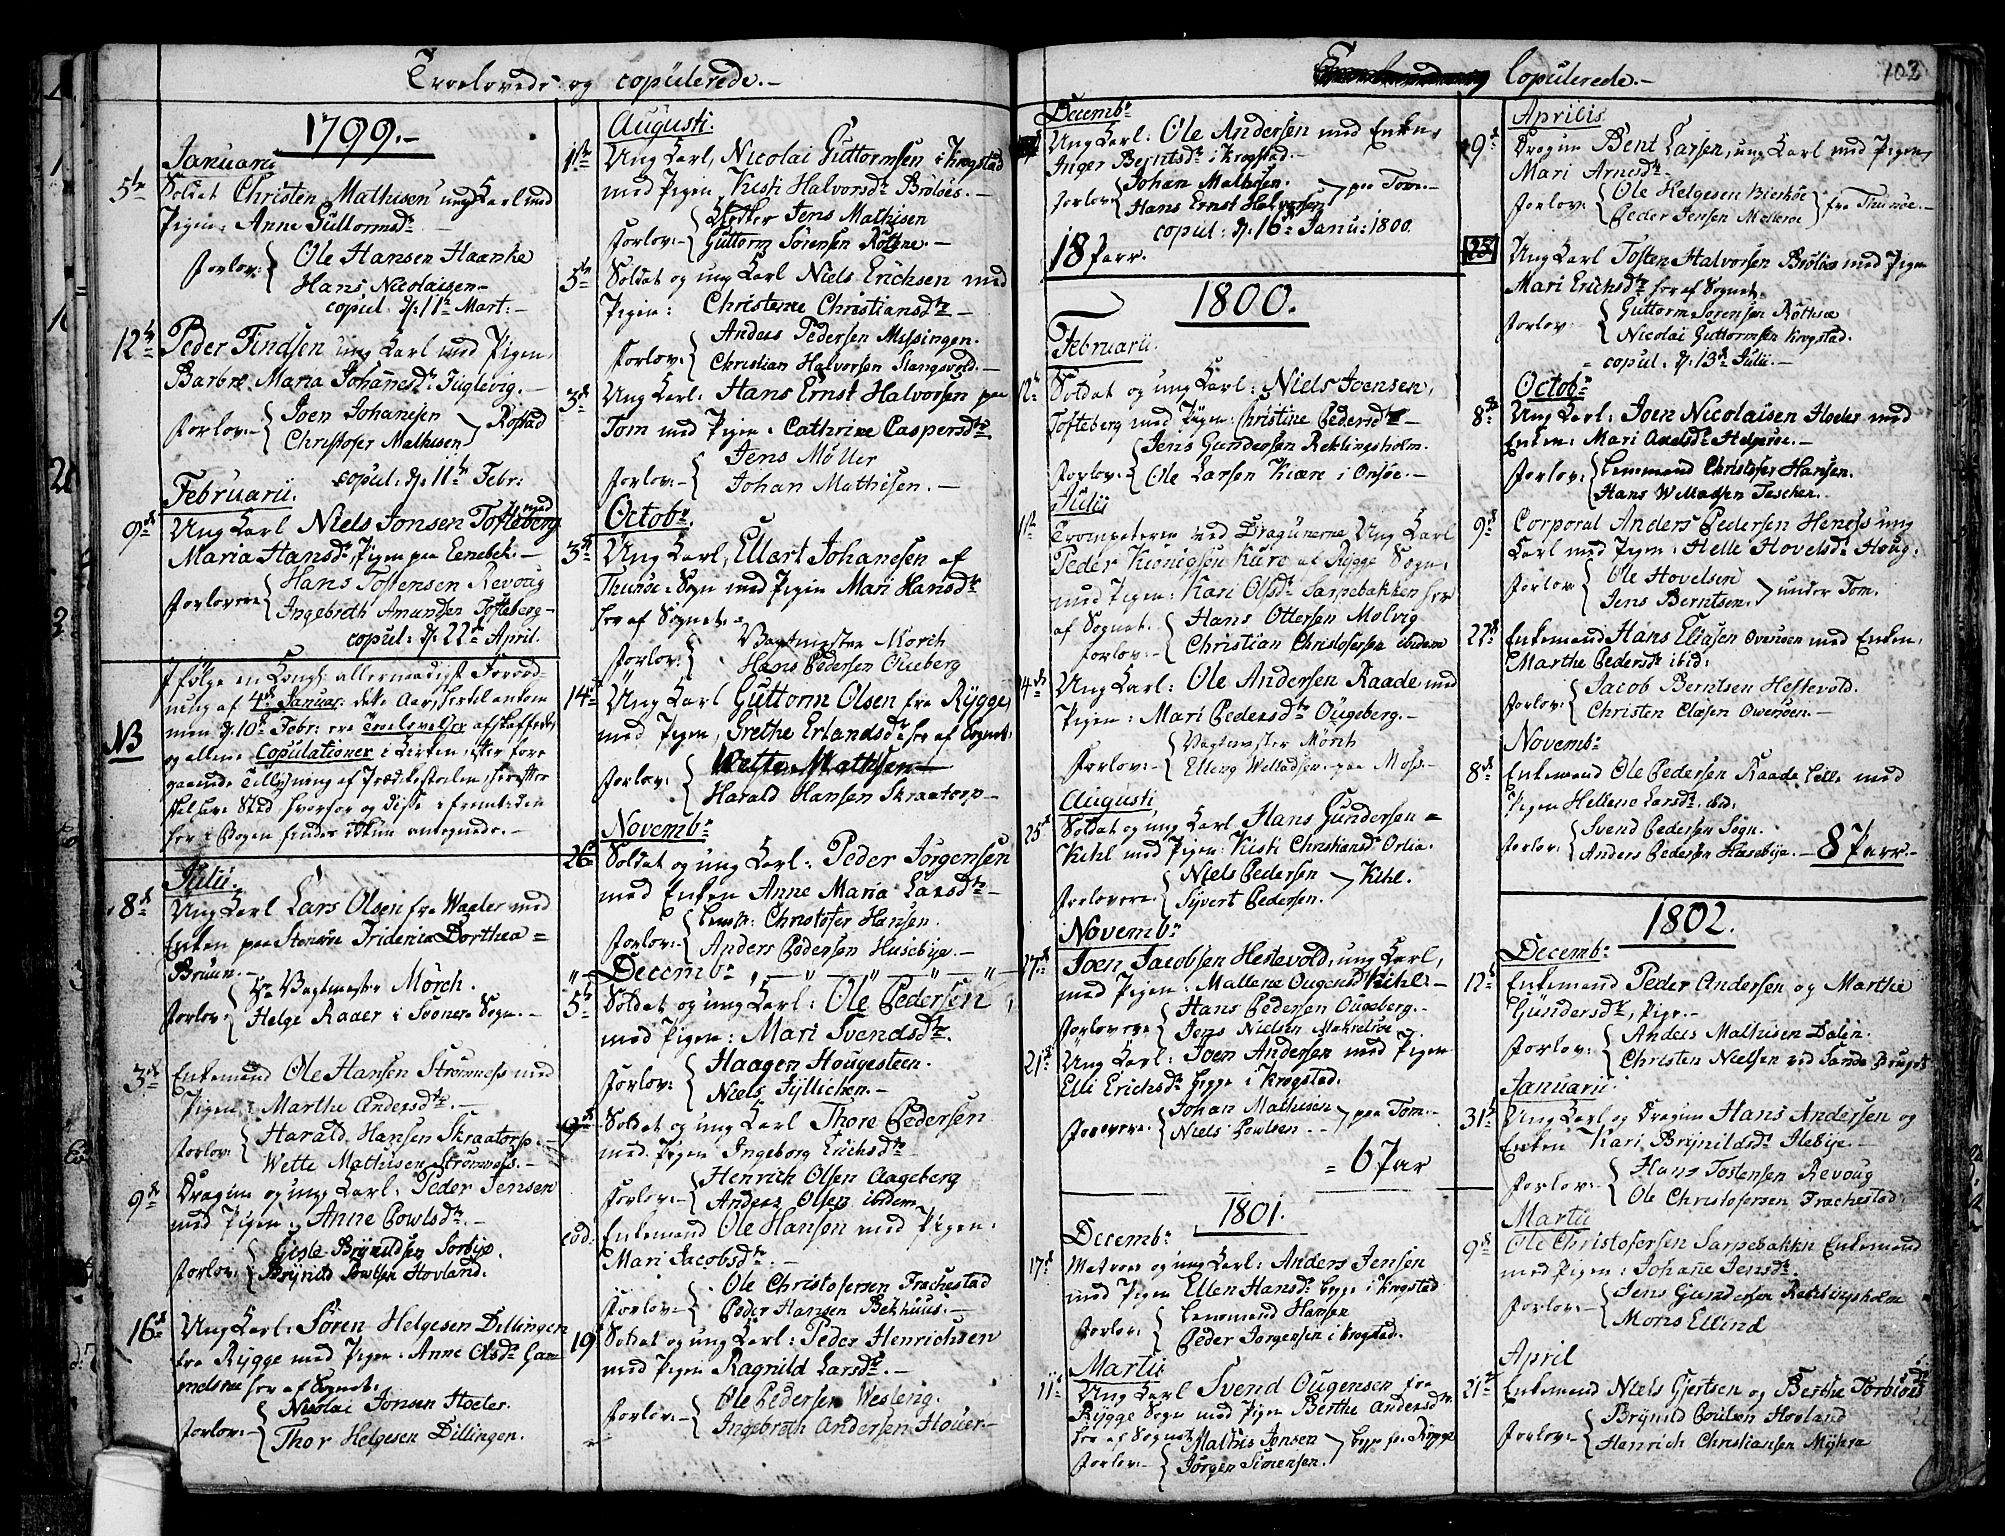 SAO, Råde prestekontor kirkebøker, F/Fa/L0002: Ministerialbok nr. 2, 1762-1806, s. 102